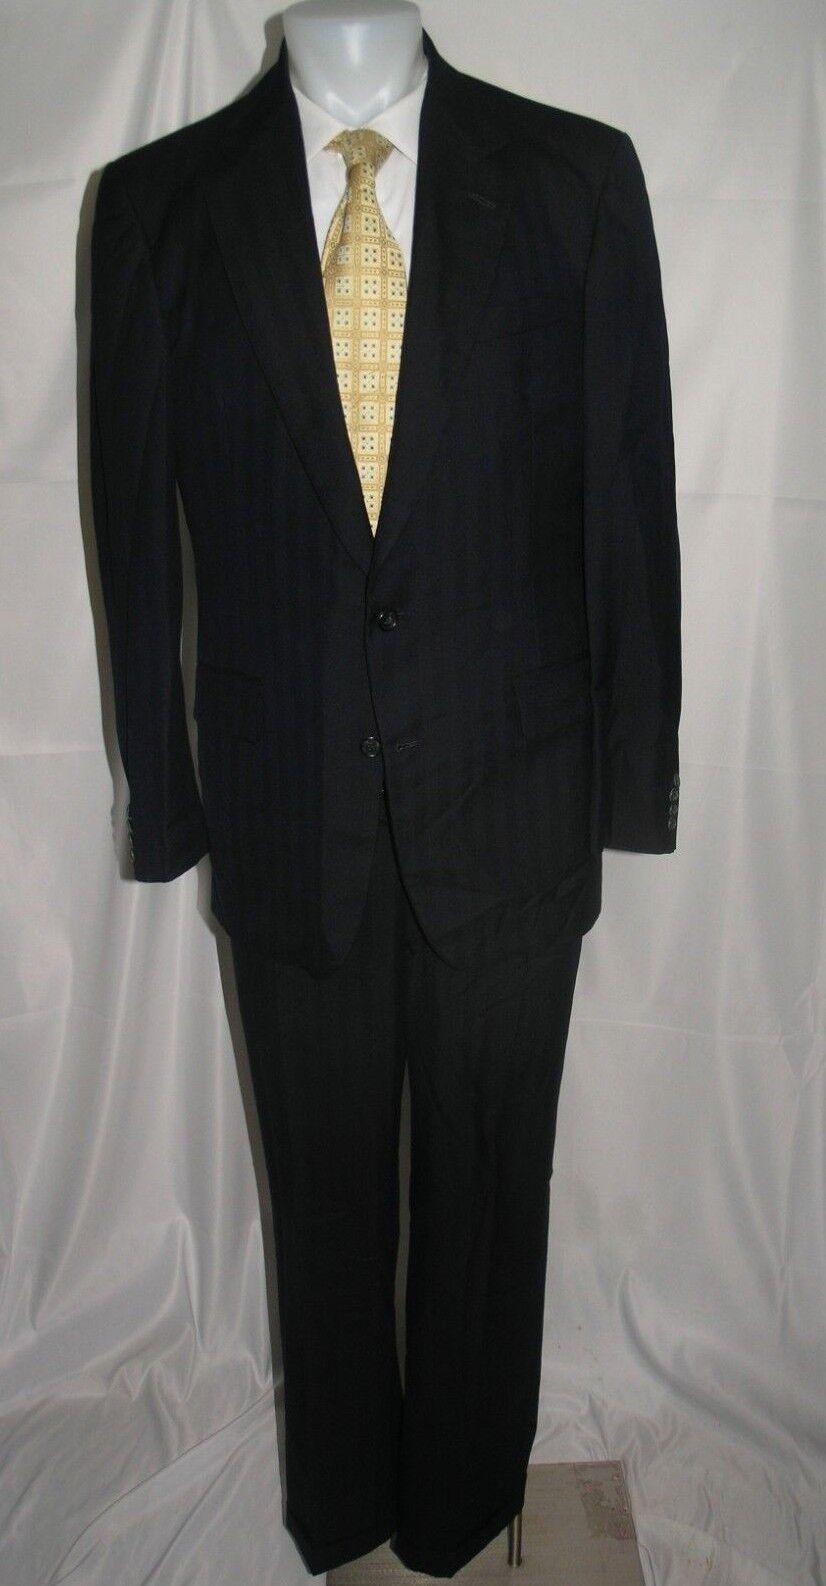 Martin Grünfield Bespoke Custom Two Button Suit 40 R 33 x 30